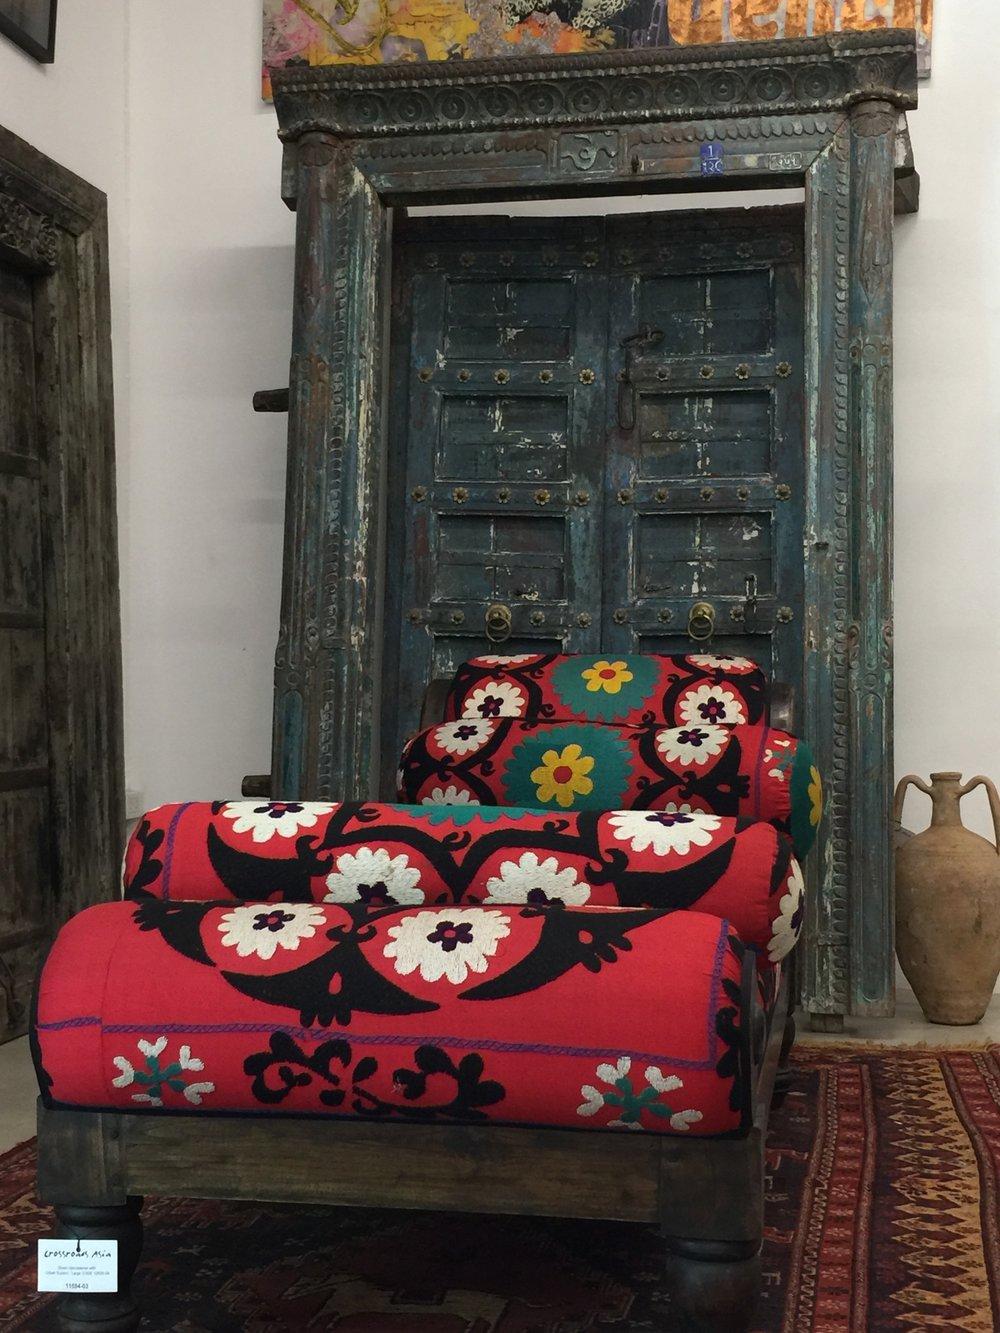 Divan Upholstered with Uzbek-Suzeini